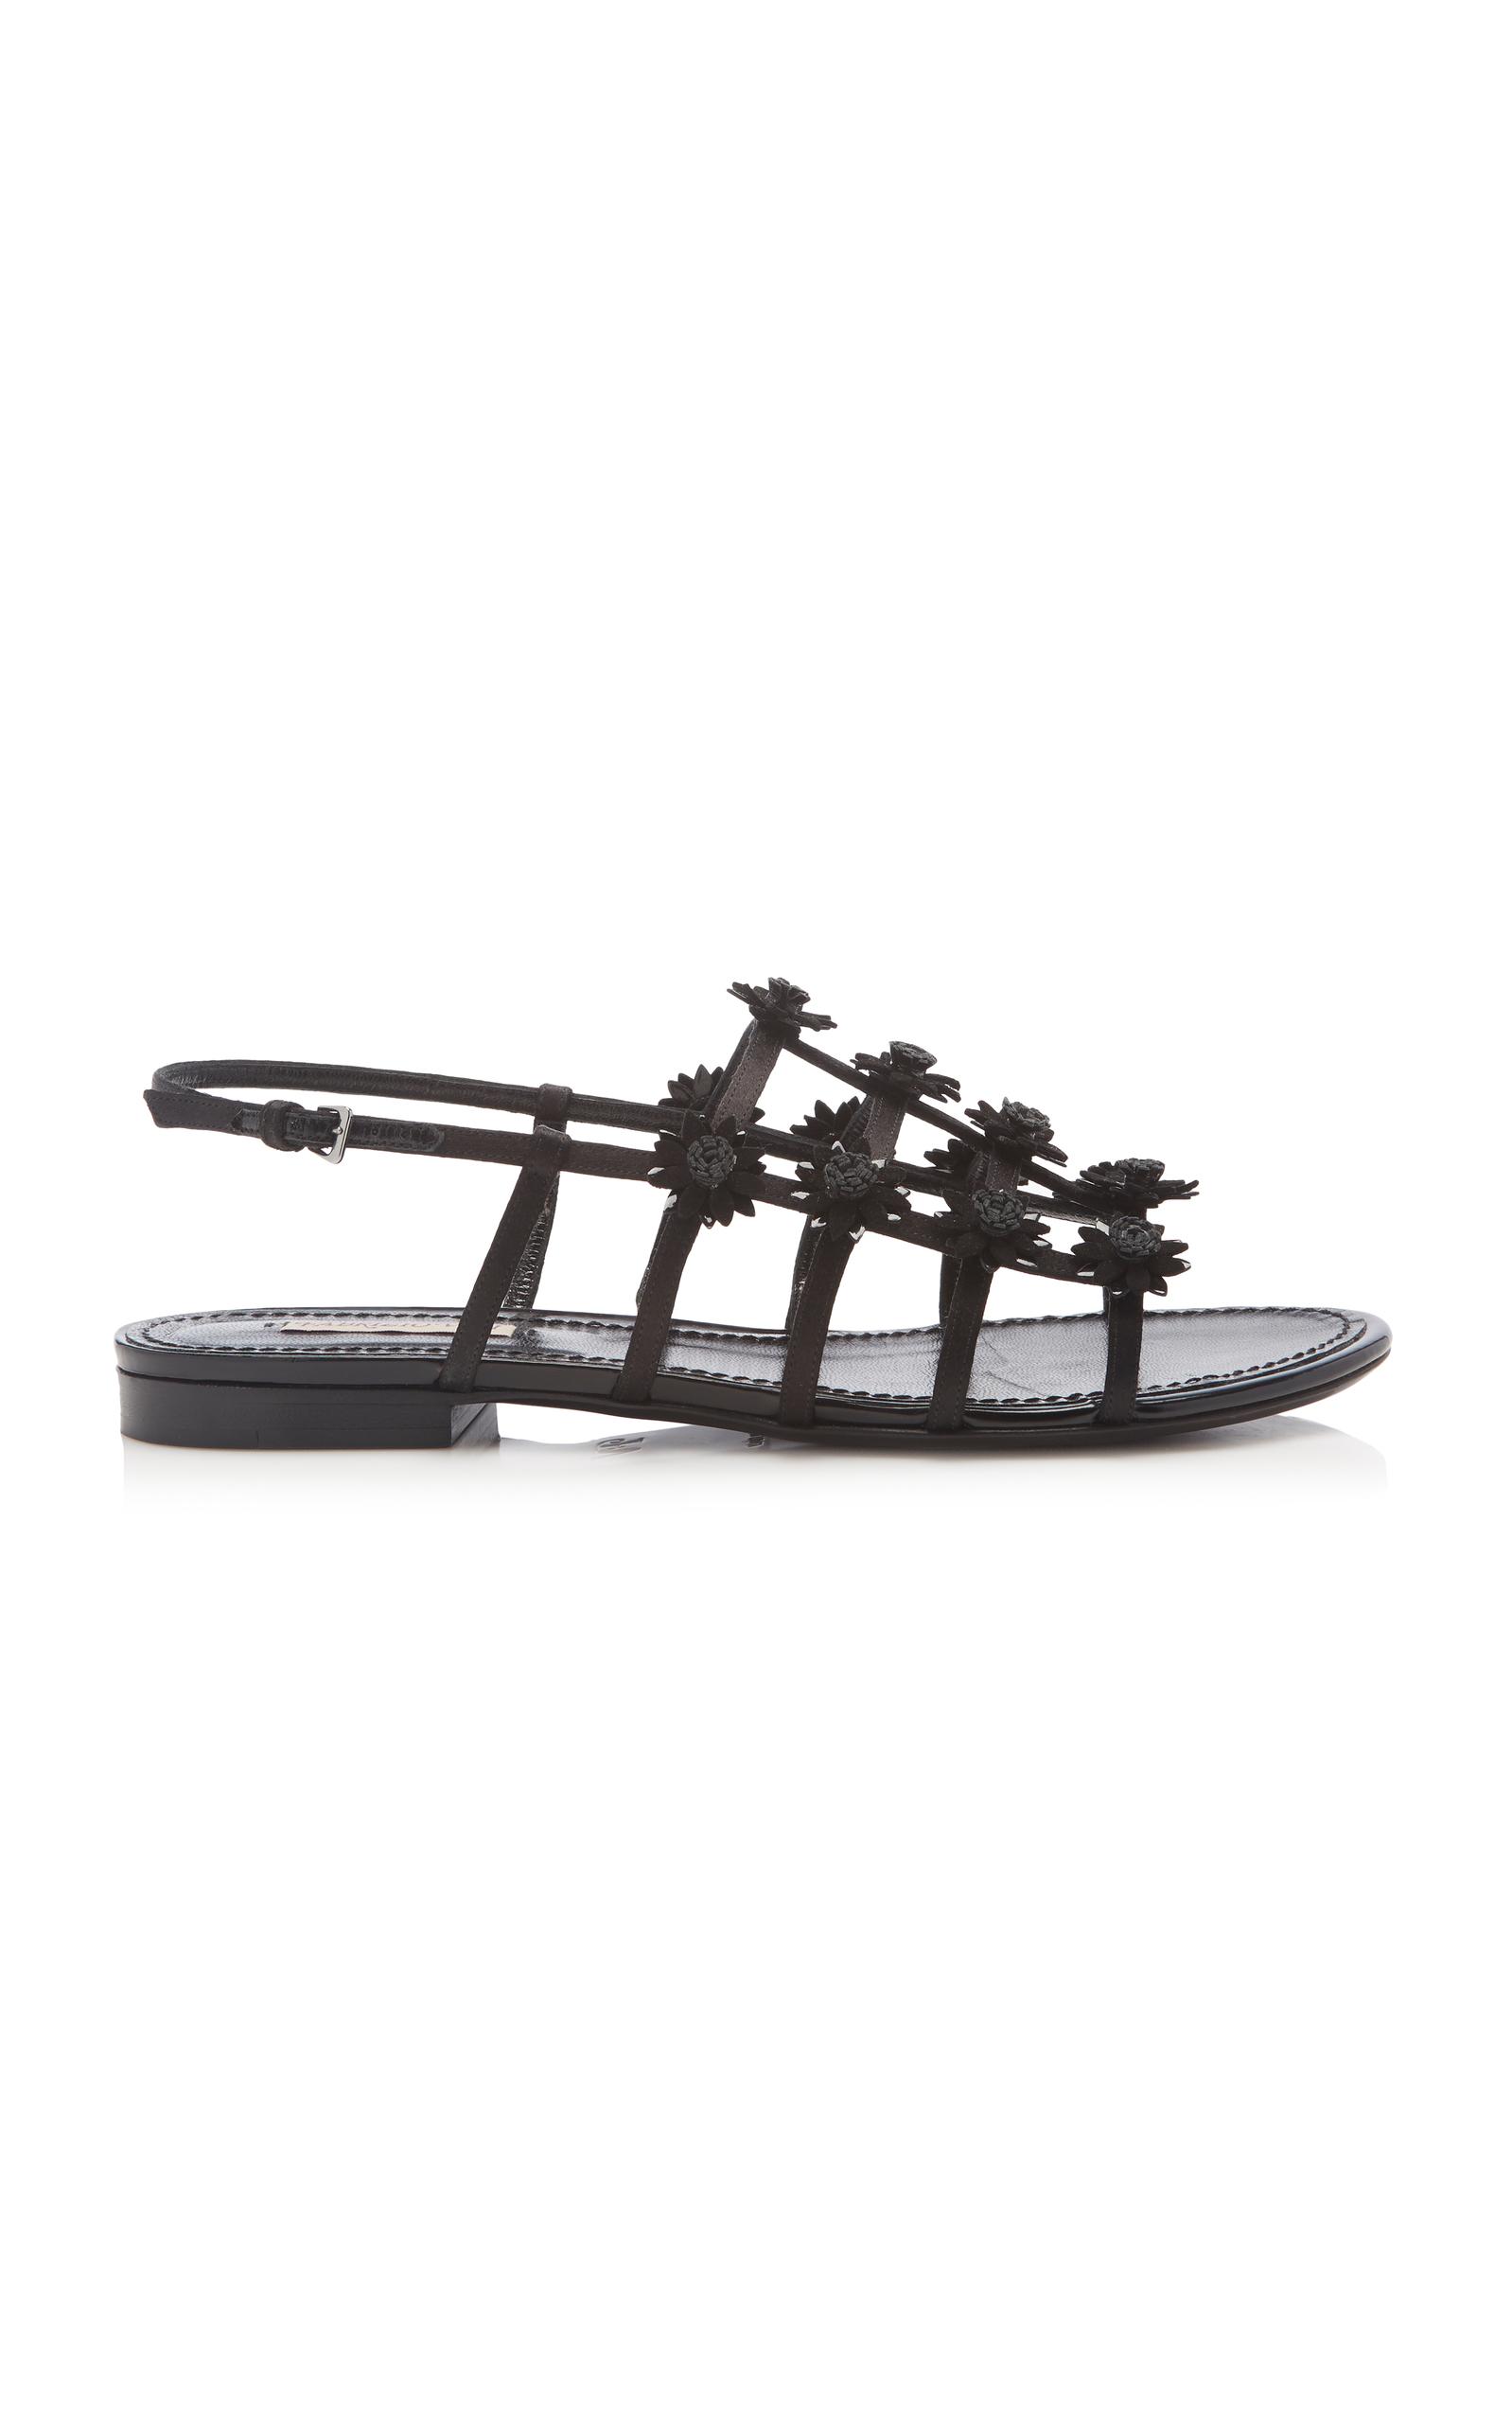 FABRIZIO VITI Daisy-Appliquéd Satin Slingback Sandals - Black Size 10.5